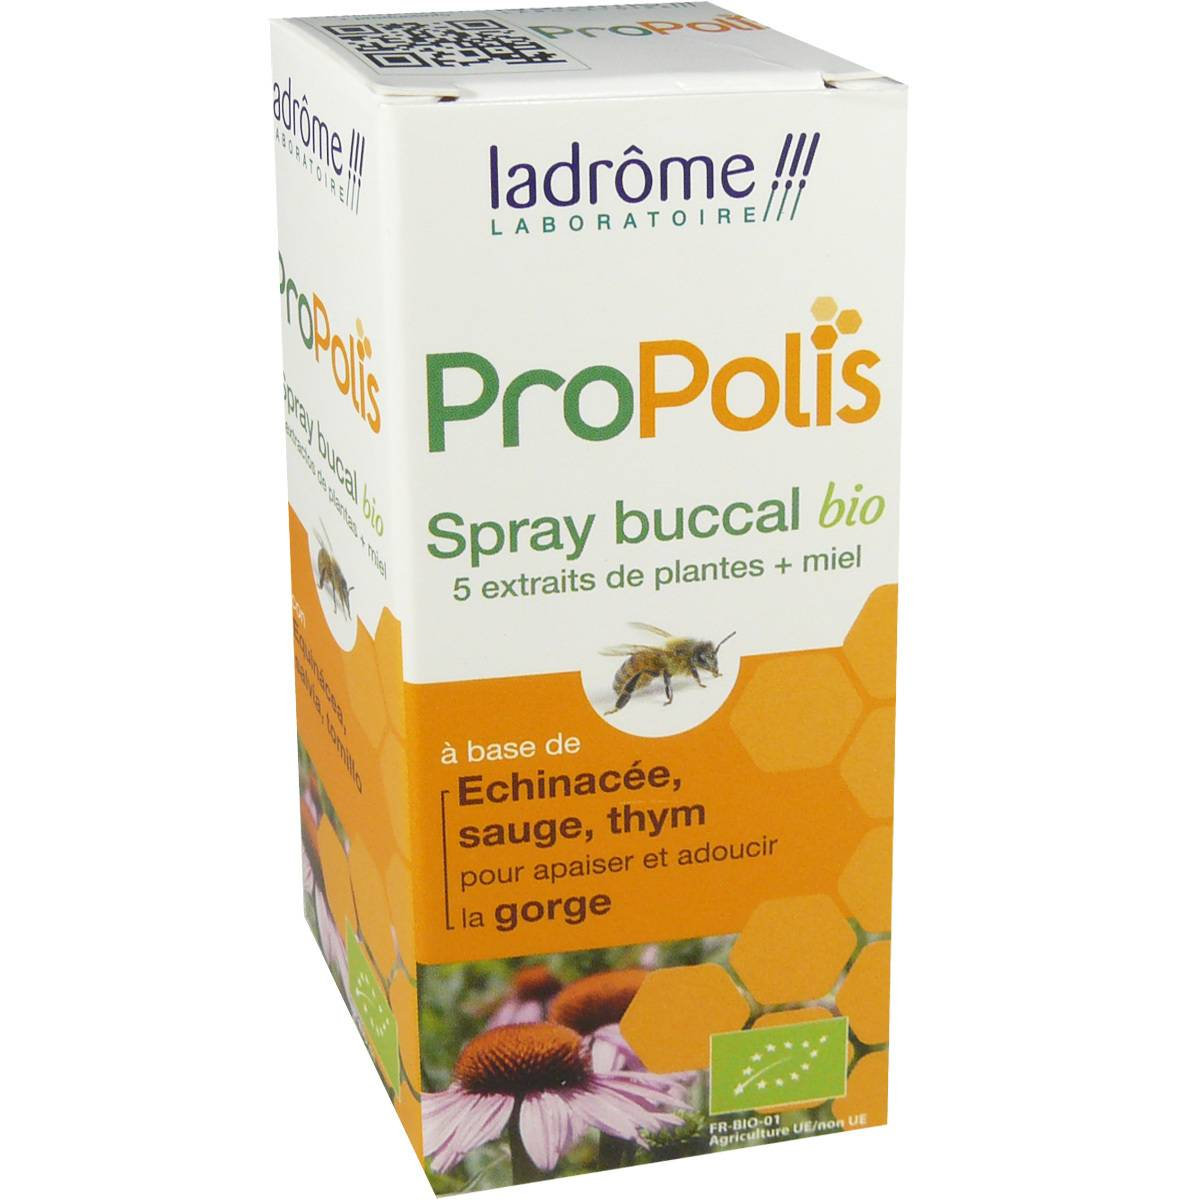 Ladrome propolis spray buccal bio 5 plantes + miel 30 ml